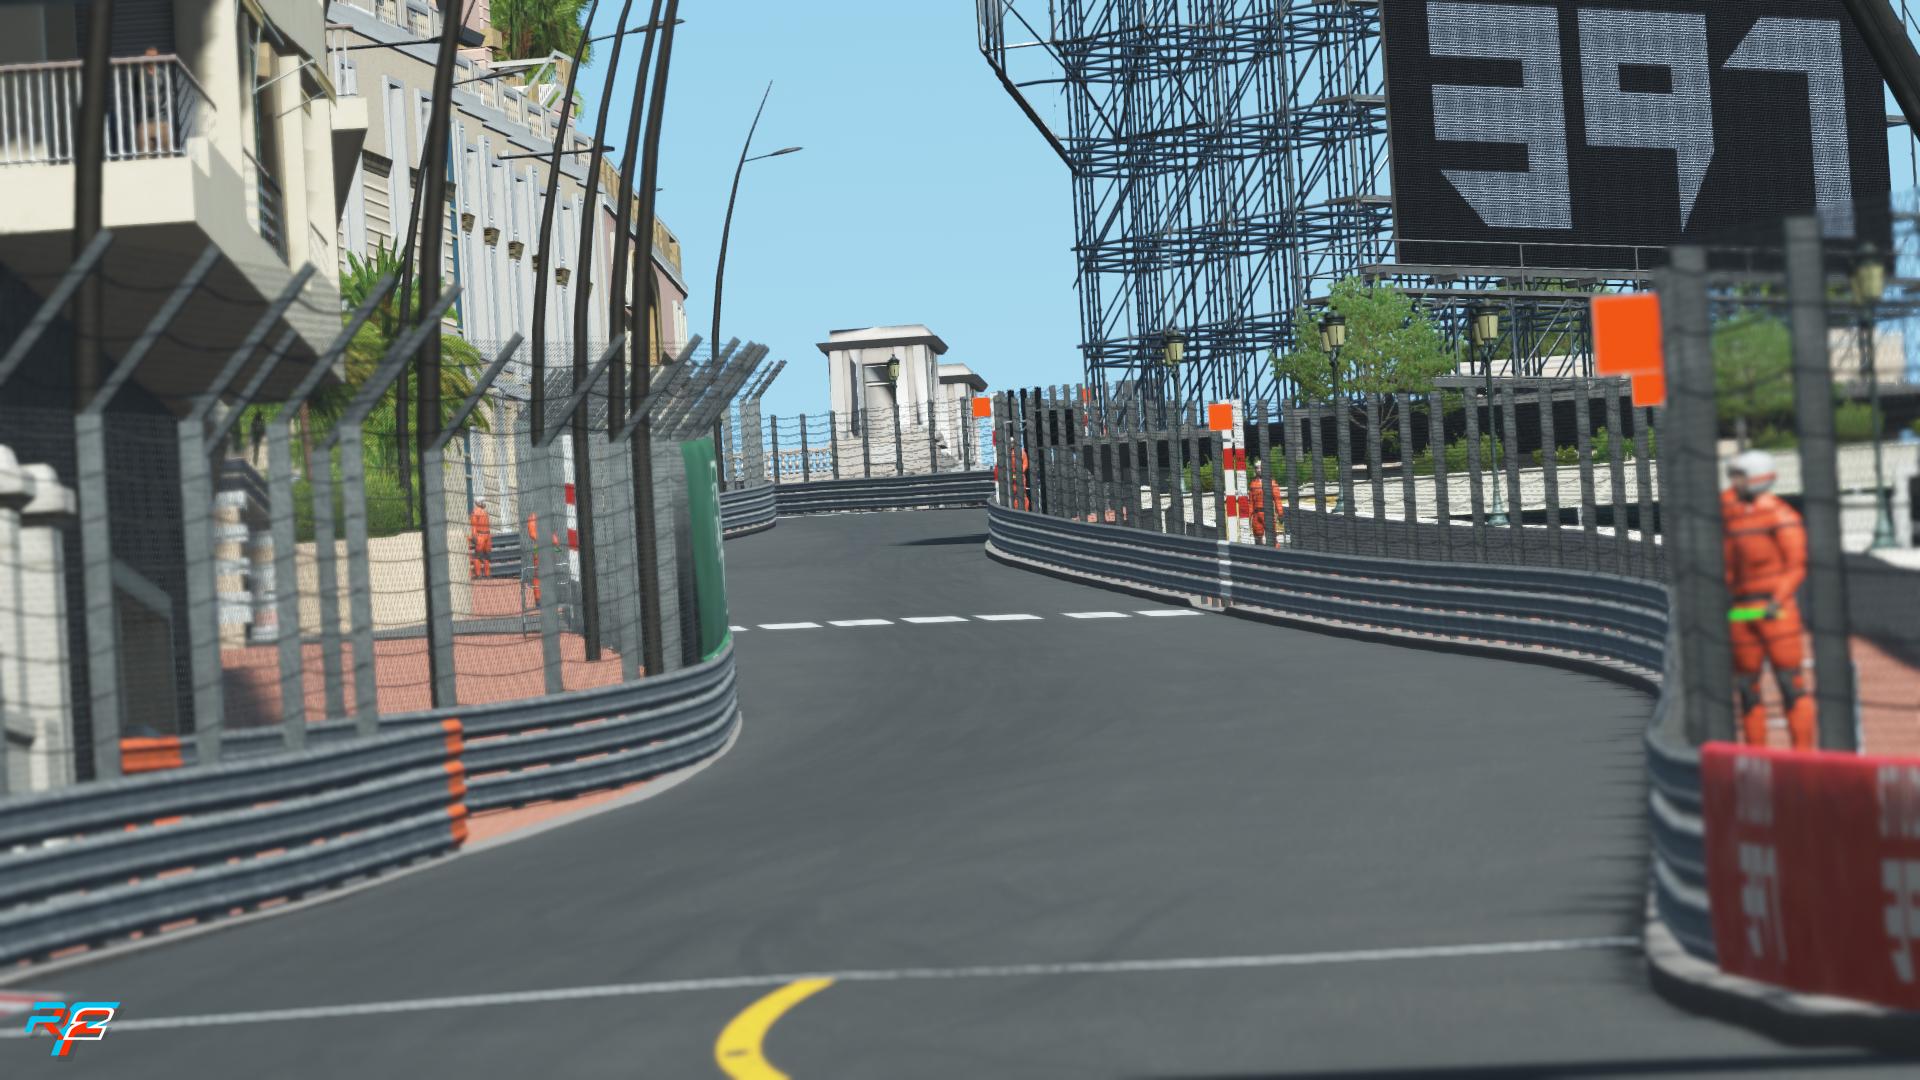 March-Roadmap-Azur-Update.jpg